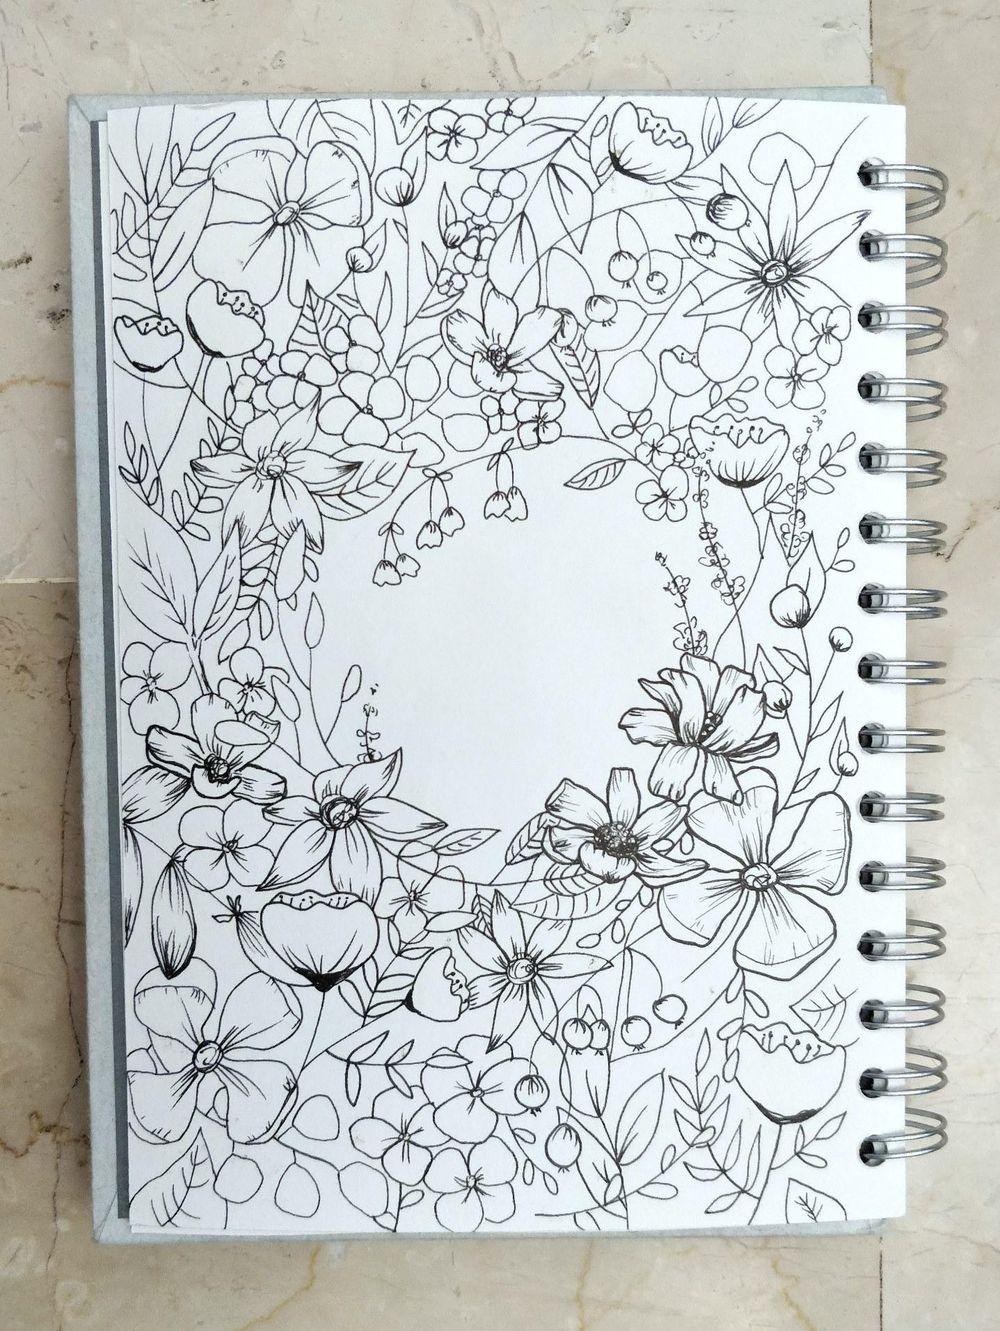 Floral Illustration: Composition Meets Negative Space - image 3 - student project